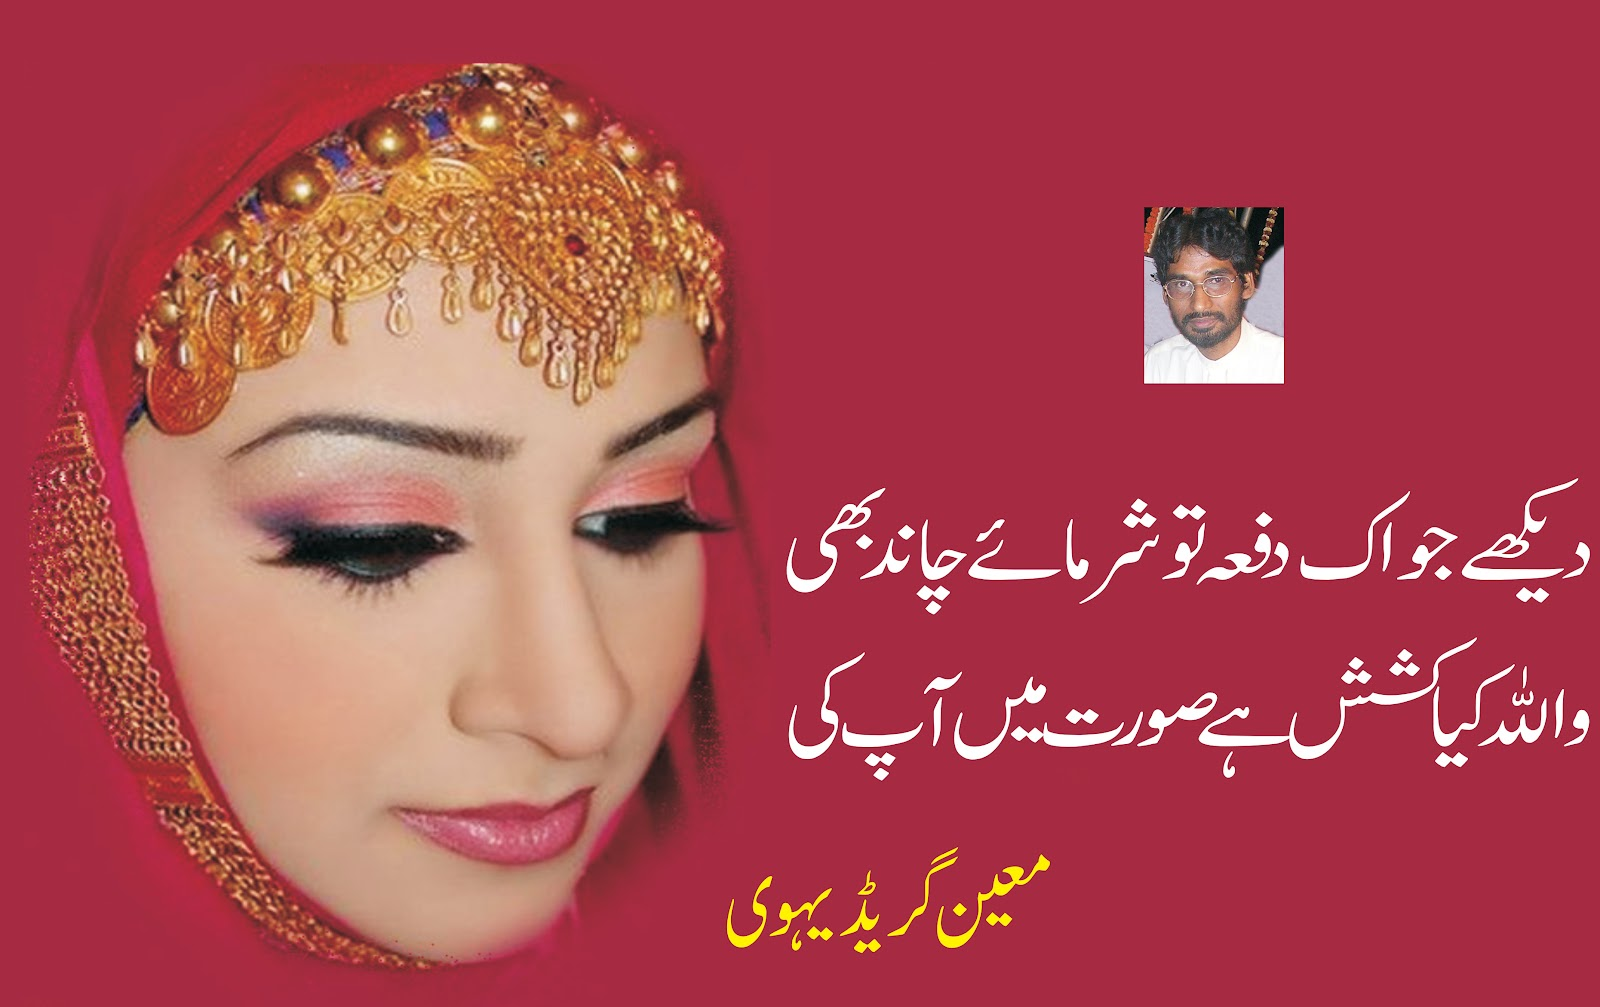 http://4.bp.blogspot.com/-x7uhK-7IeTk/T8s6Vxt-DzI/AAAAAAAABNc/ozpf7RSjnlg/s1600/moin+-++urdu+poetry+shayari.jpg